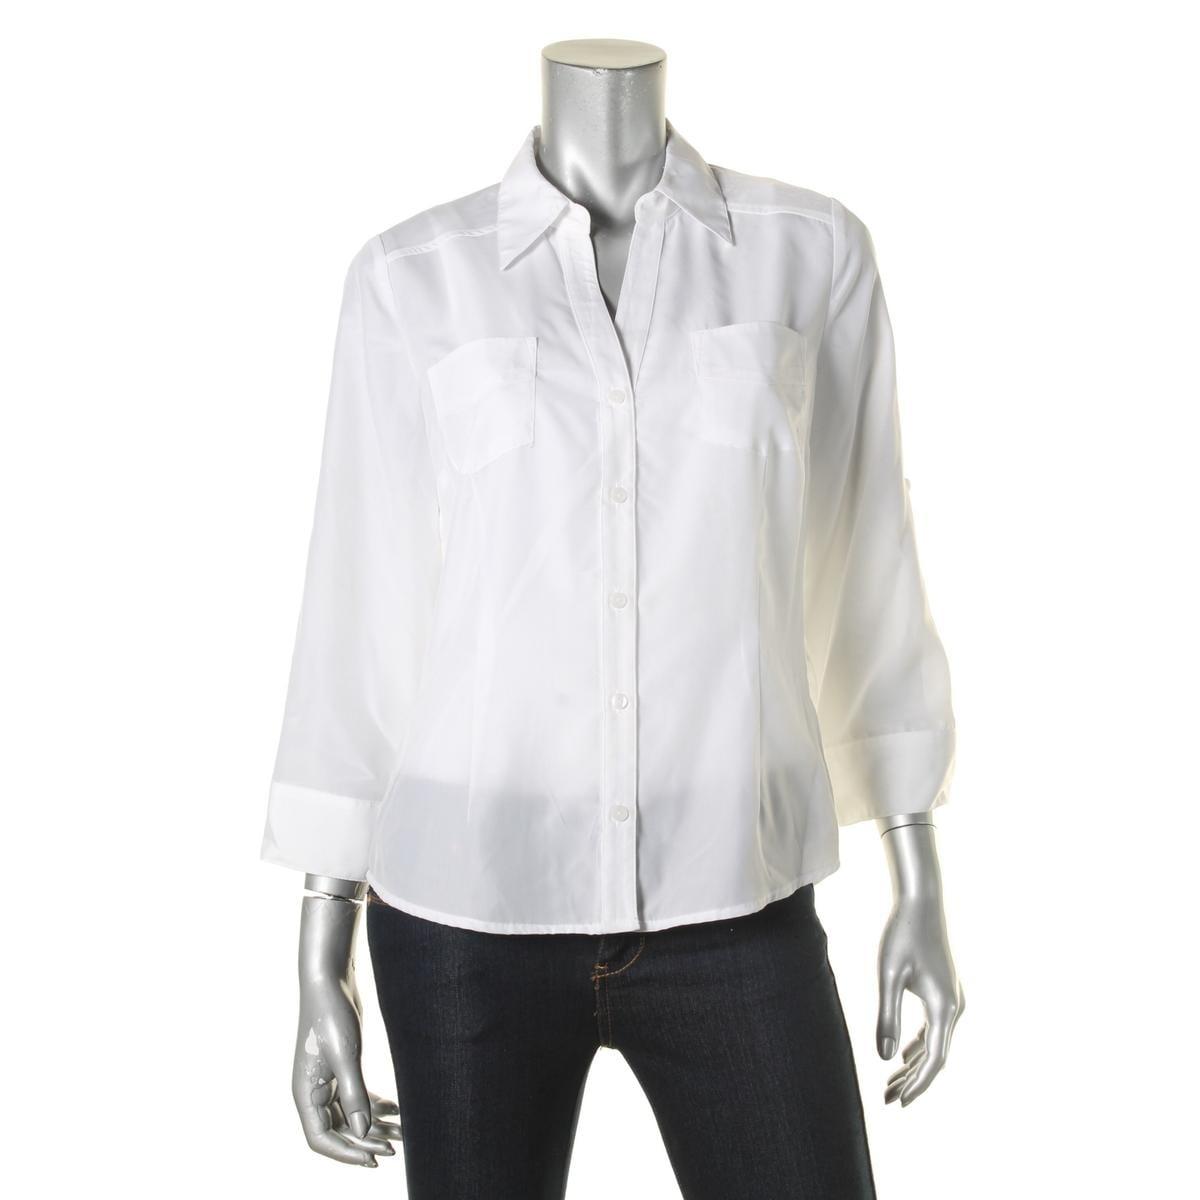 60ea0d39 Juniors Black Button Down Shirts - DREAMWORKS